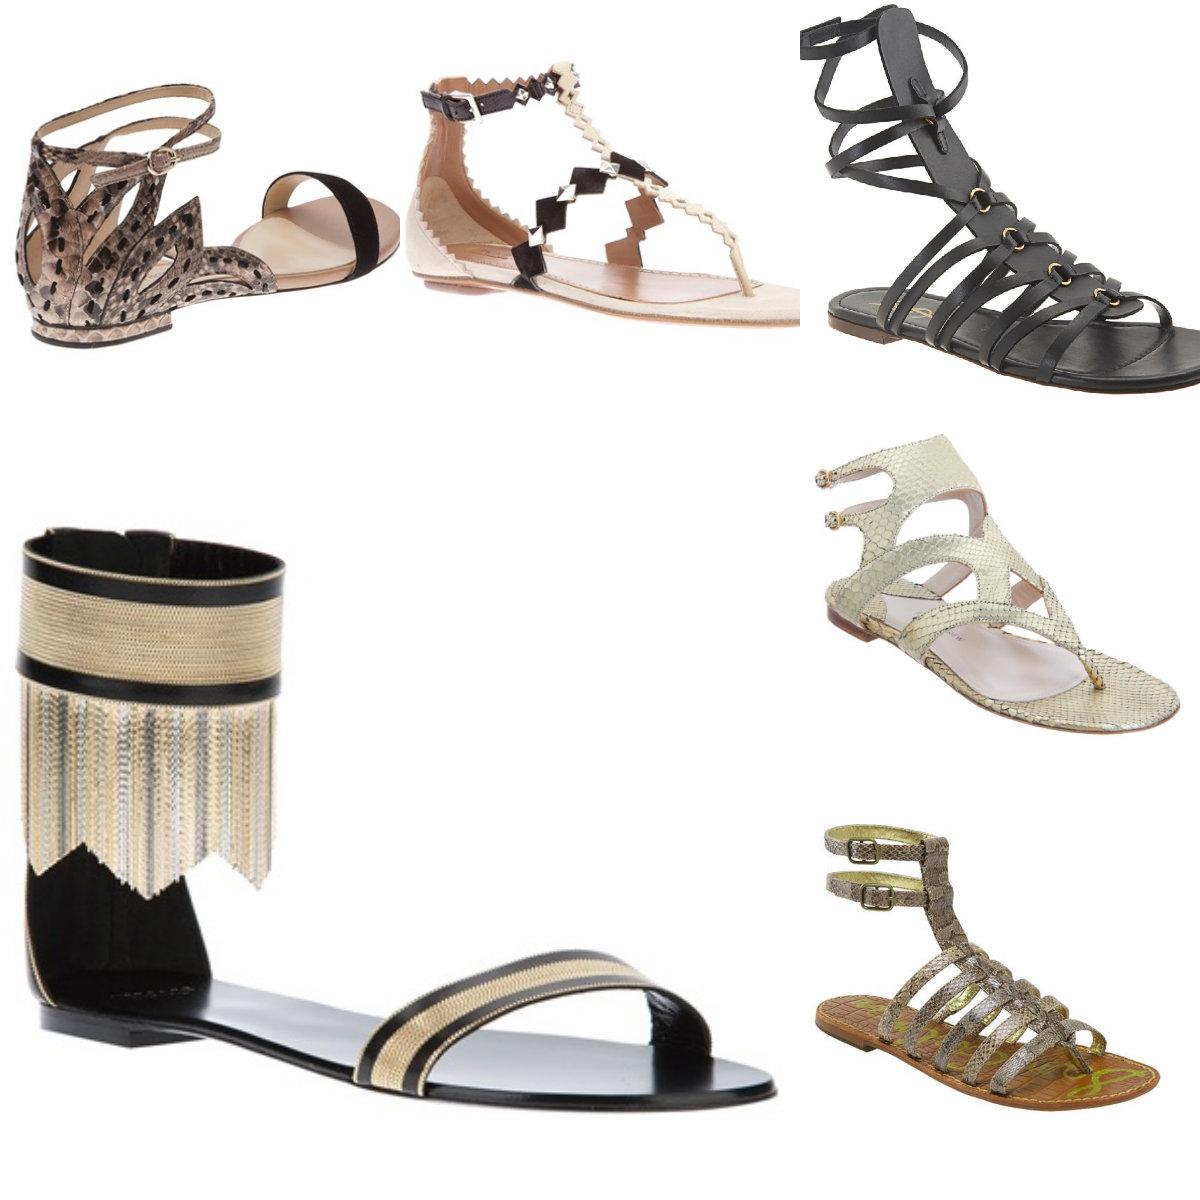 Sandal collage 1